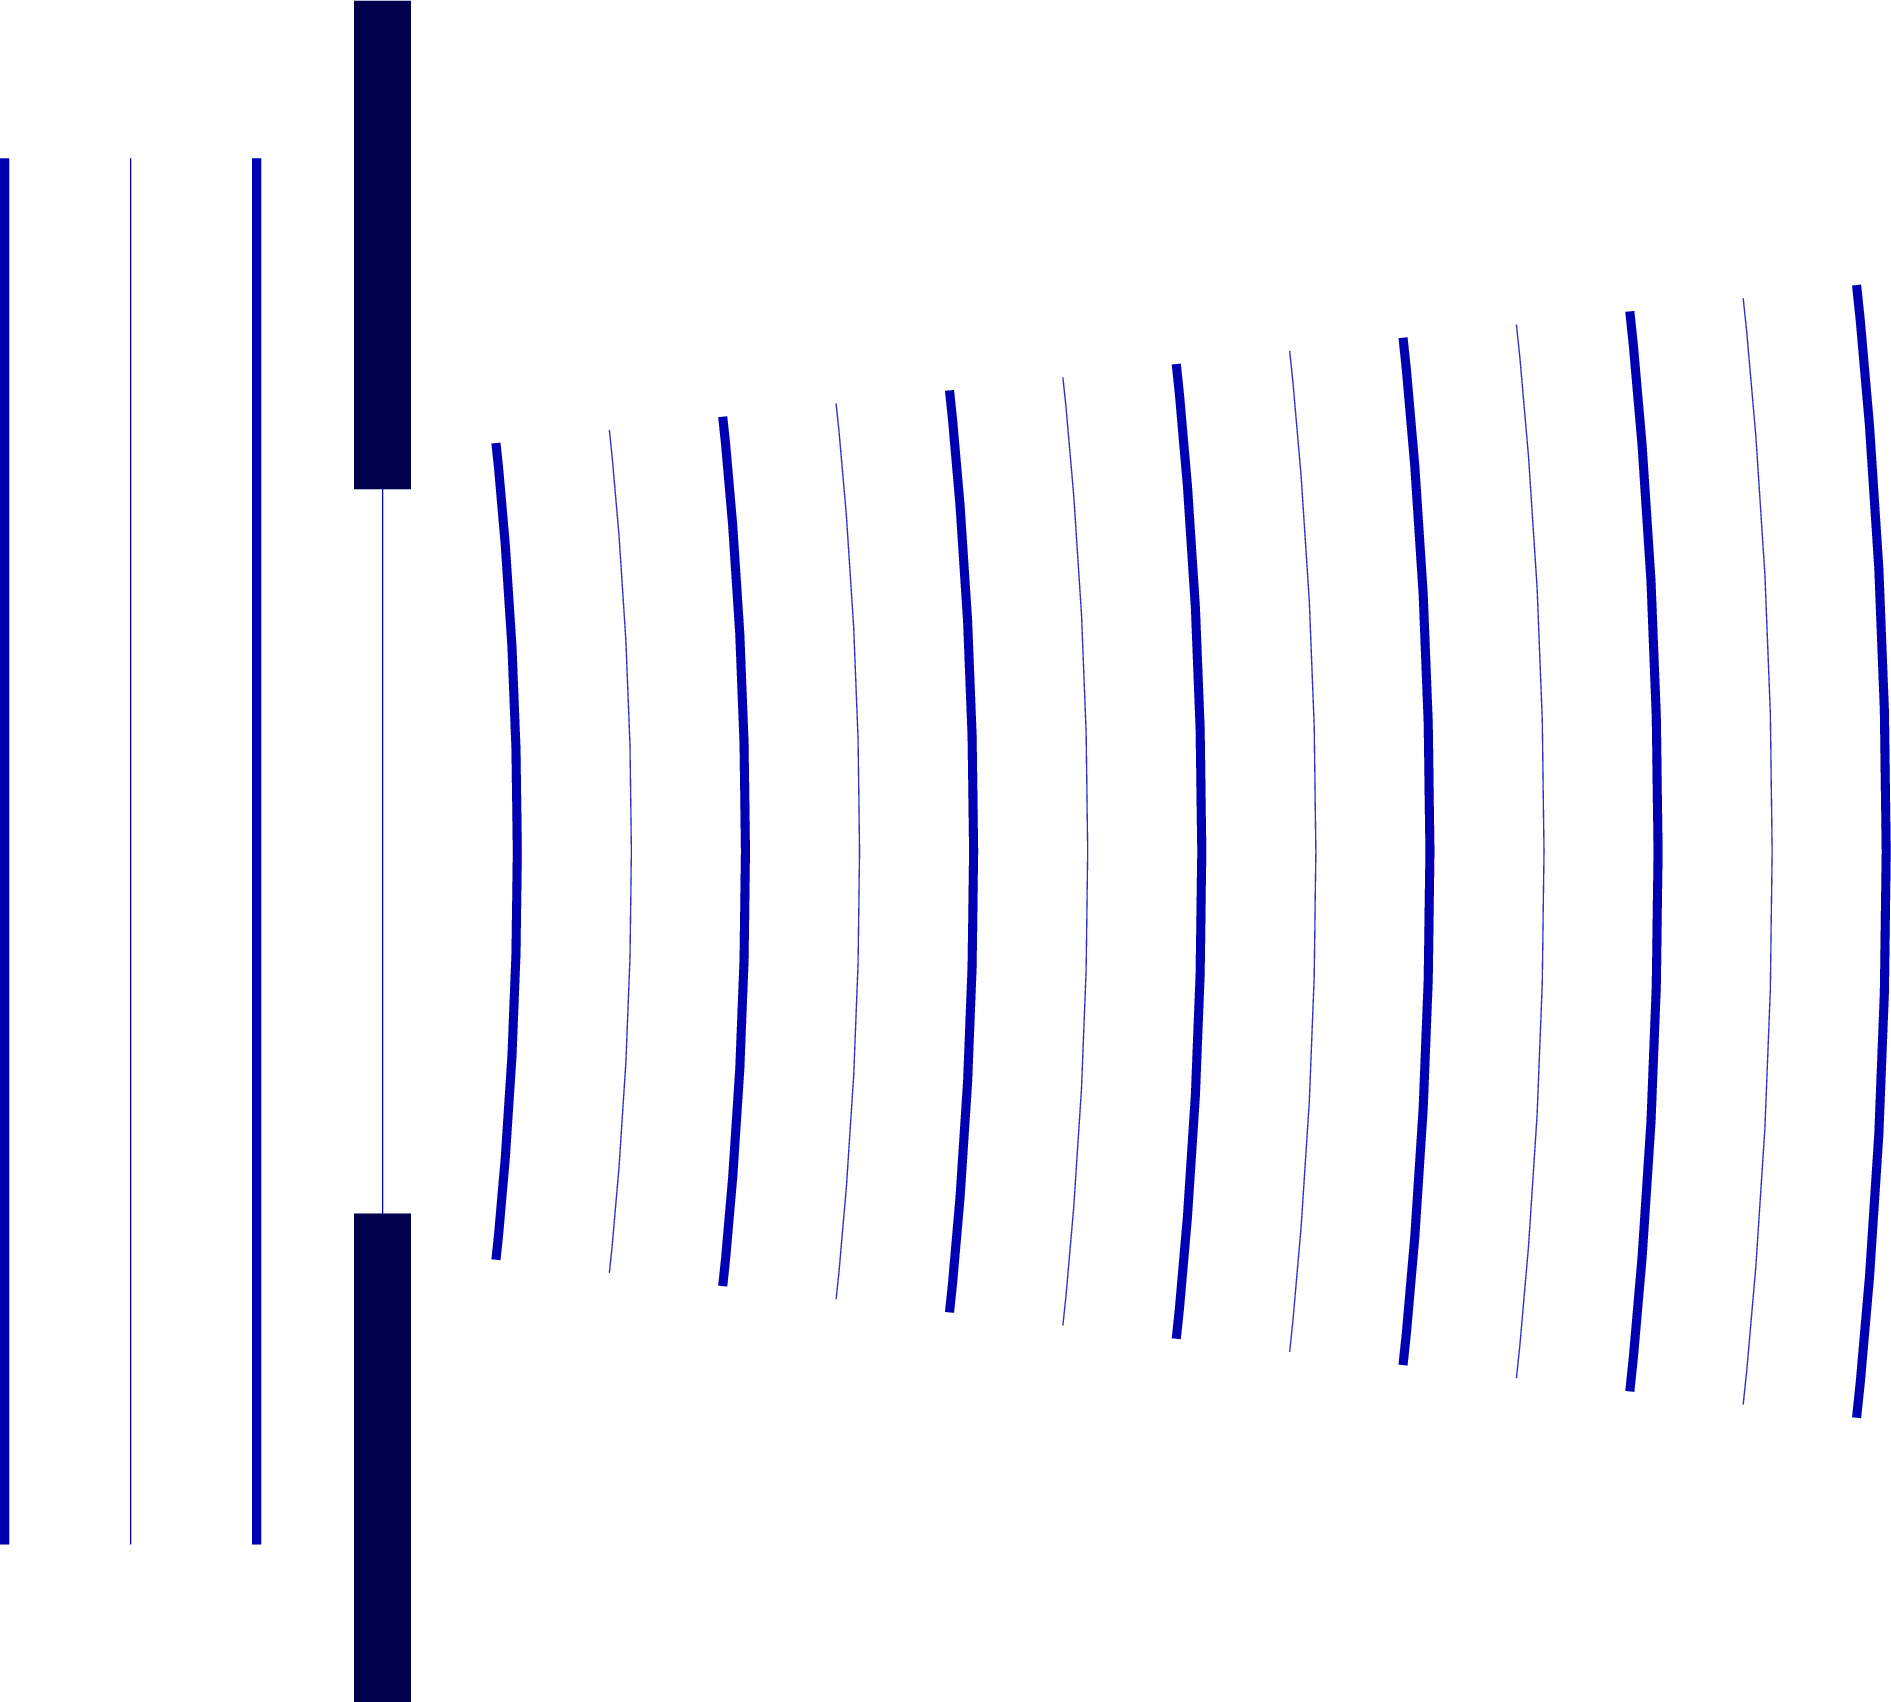 optics_diffraction-002.png